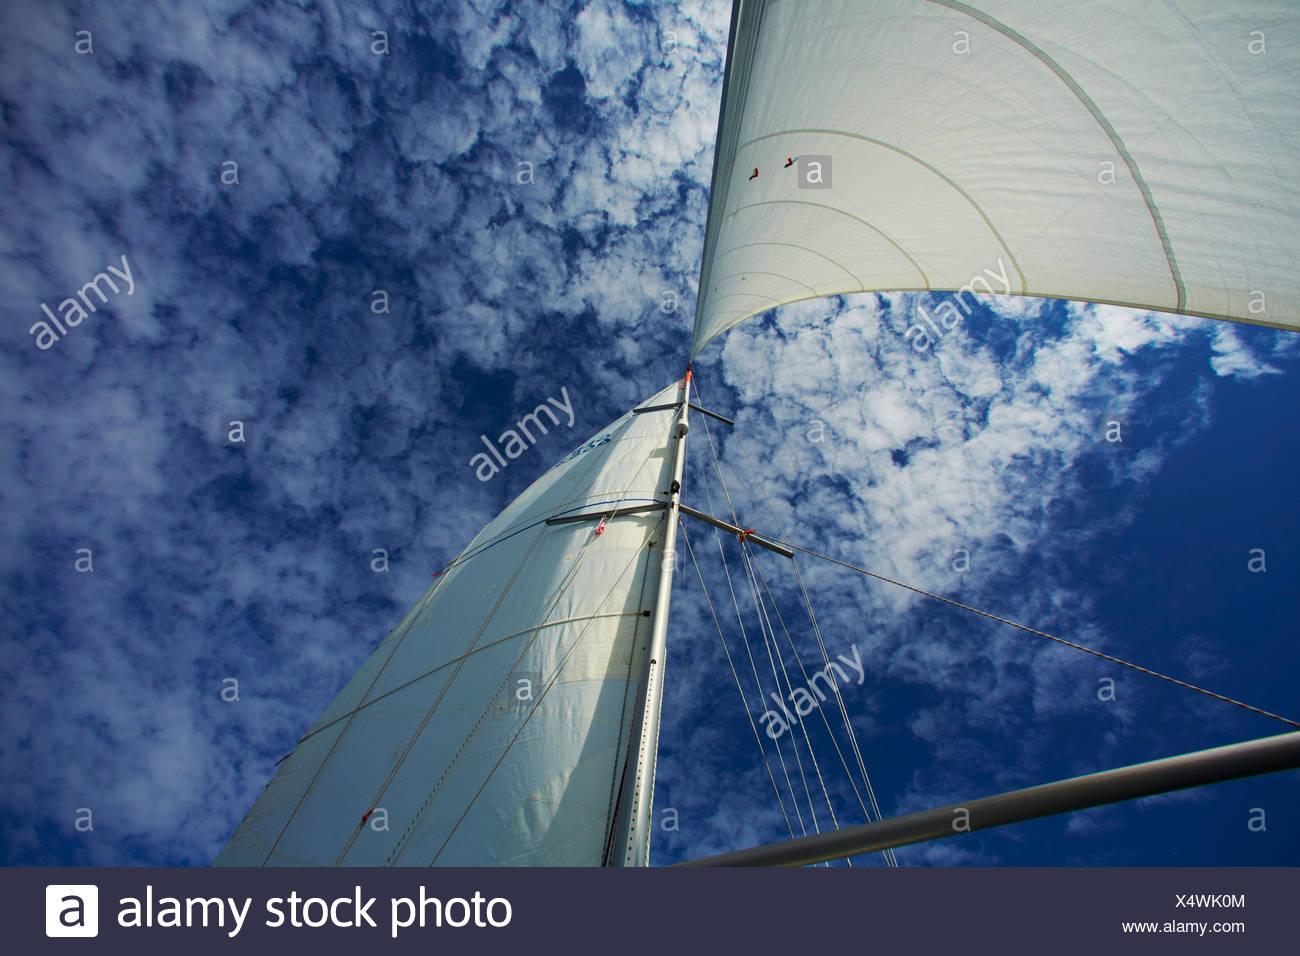 Sailing boat on baltic sea Stock Photo